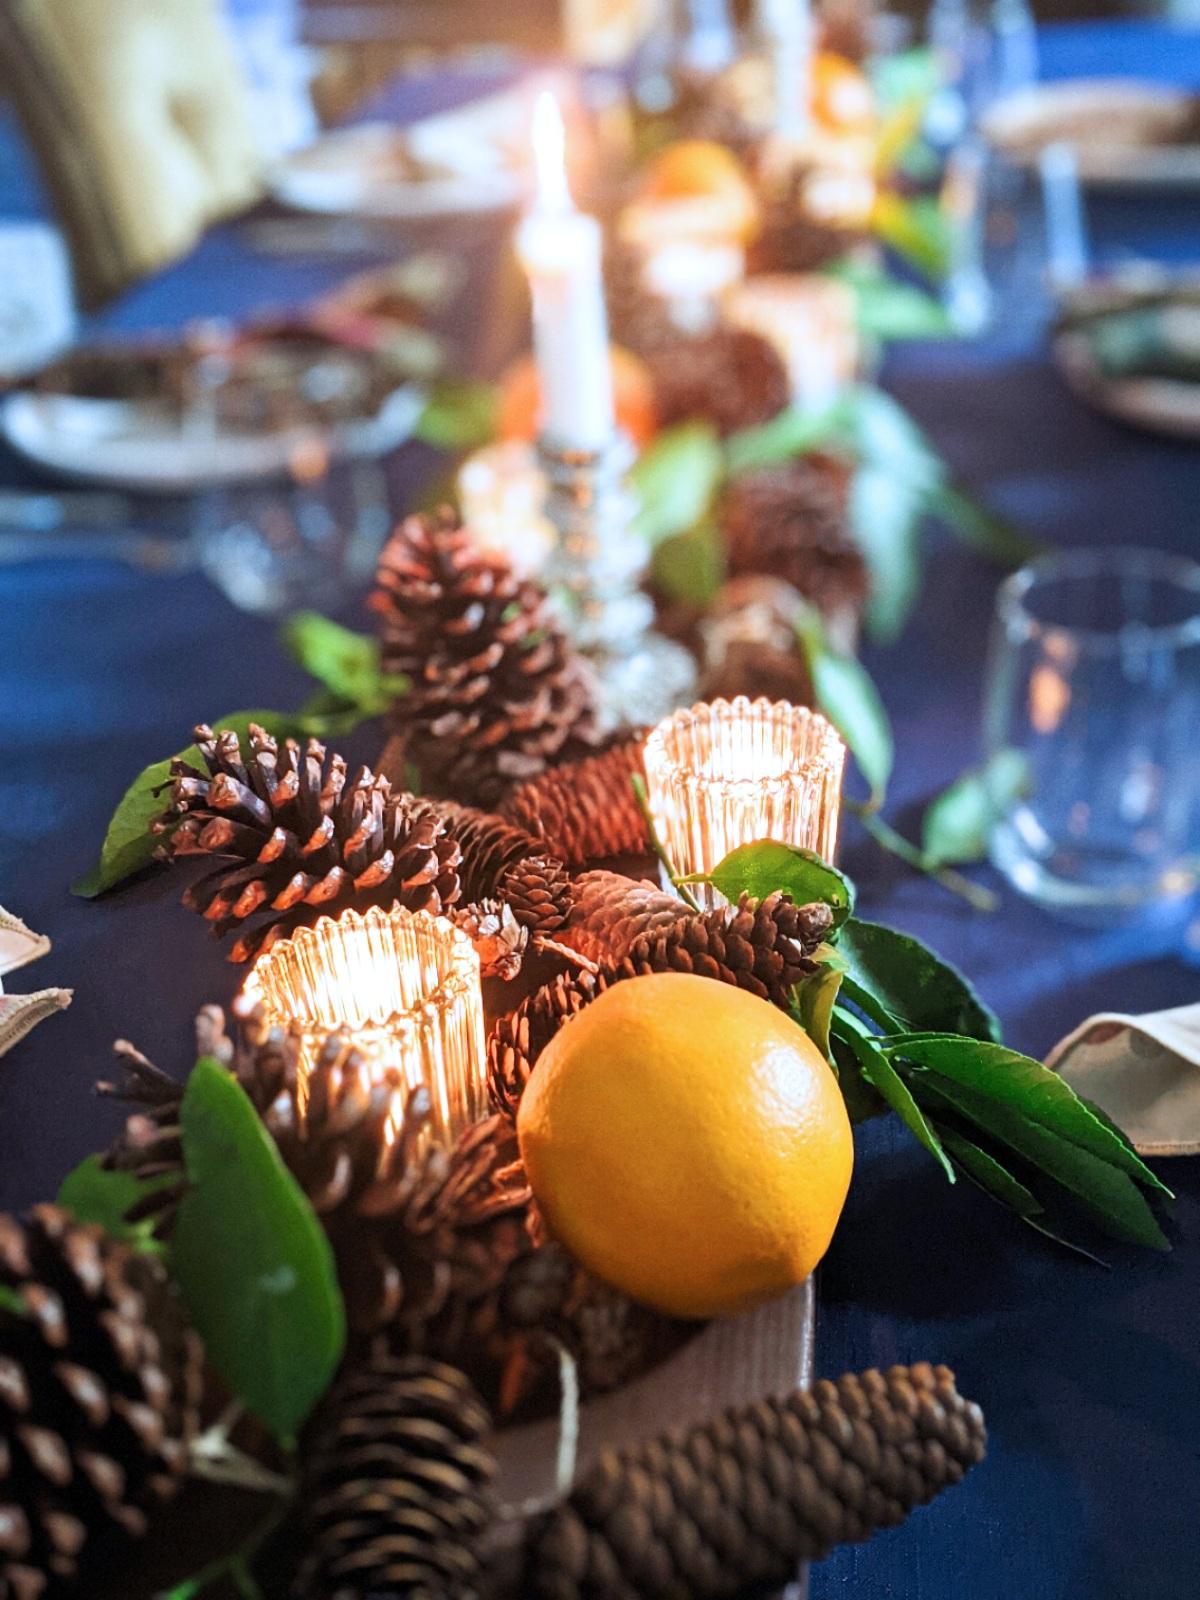 CAD Interiors dining table setting holidays fruit lemons pinecones pine garland candles natural